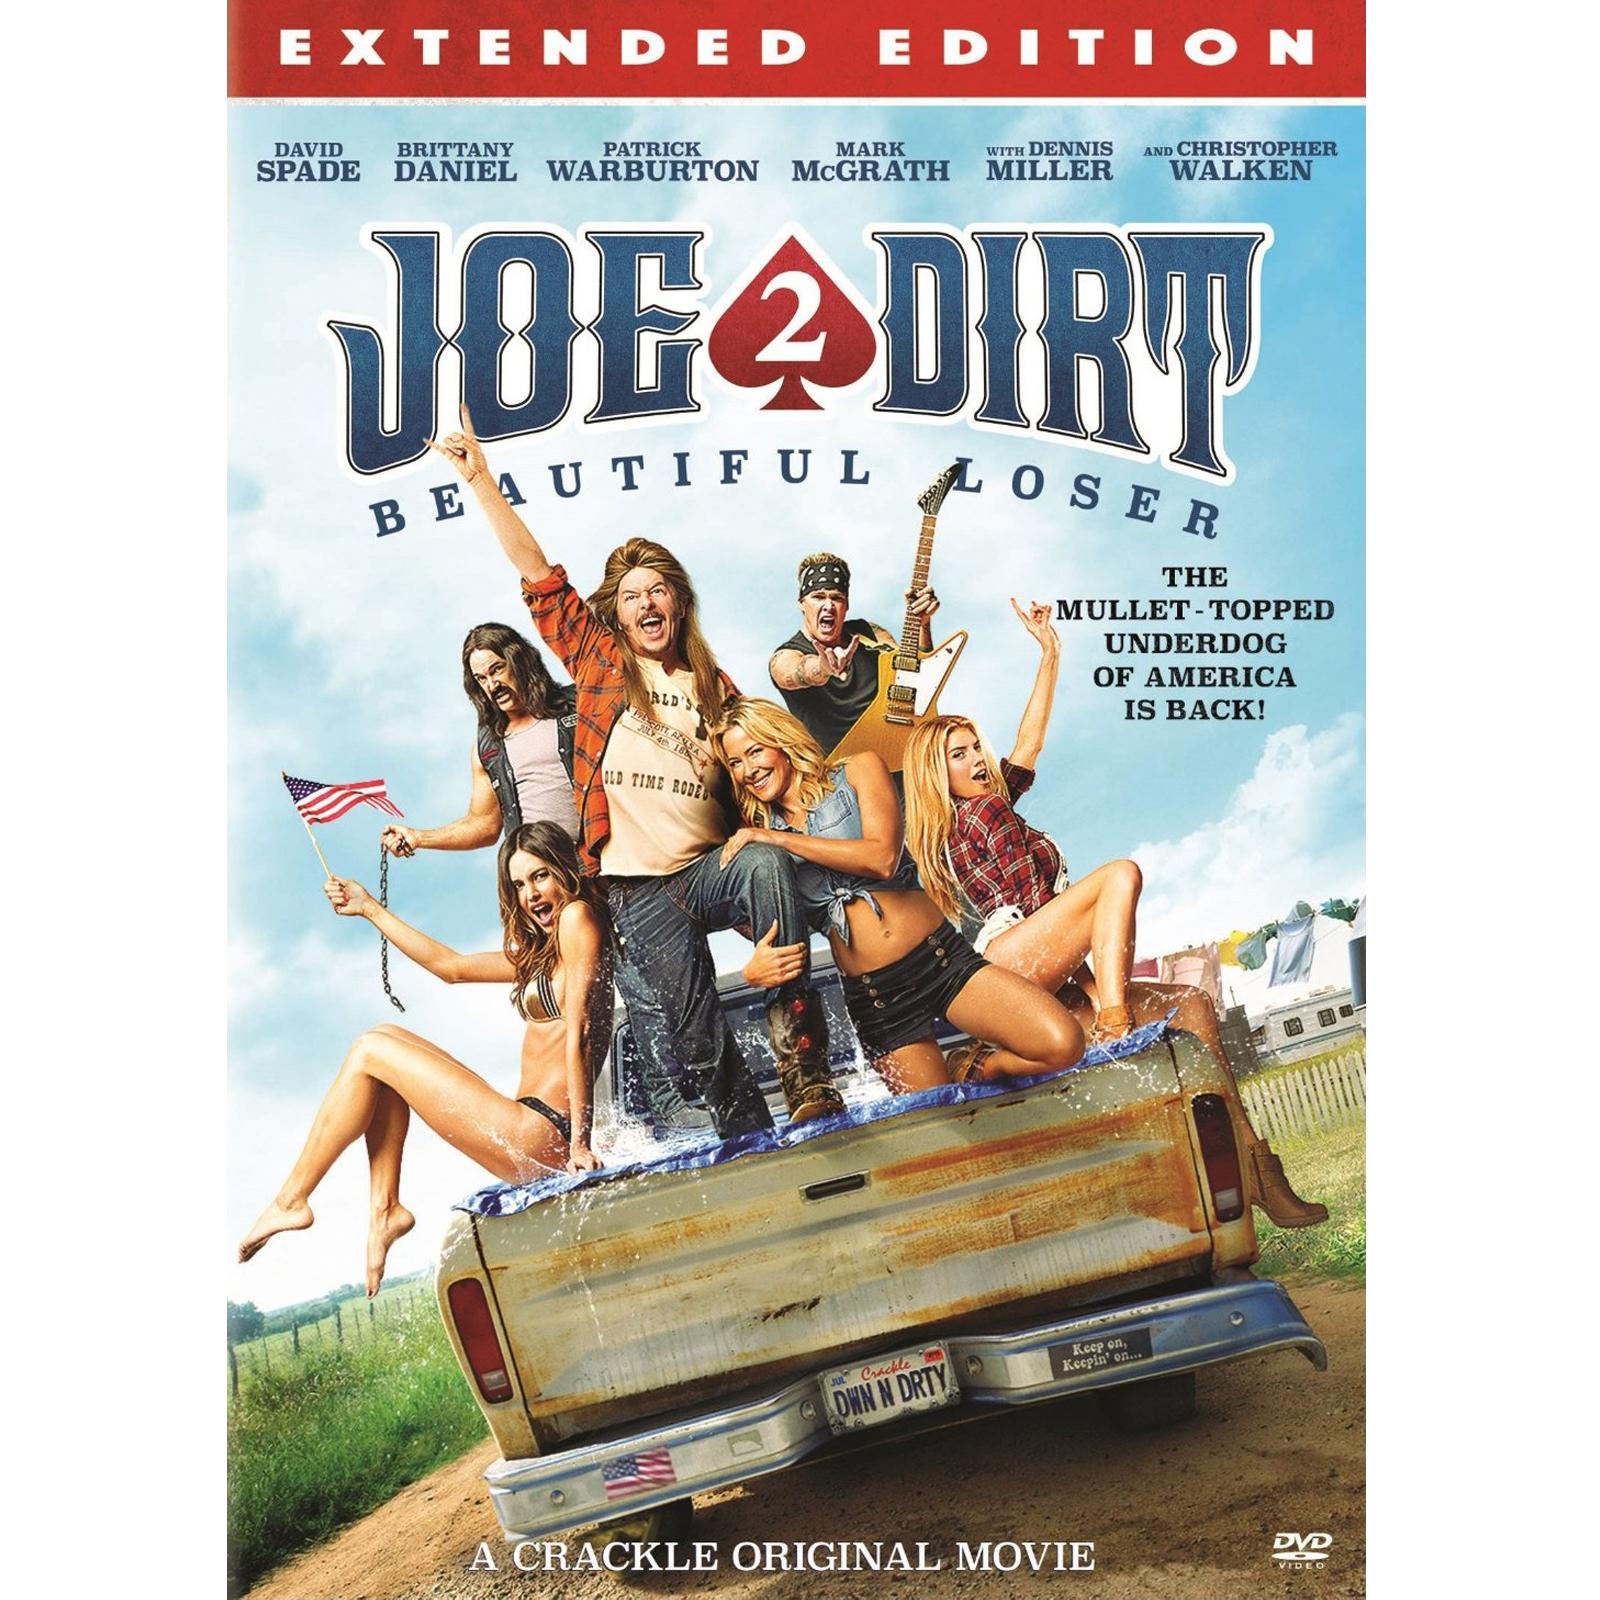 Joe Dirt 2: Beautiful Loser (DVD / Digital) PartNumber: SPM14562435115 KsnValue: 8957660 MfgPartNumber: 46594